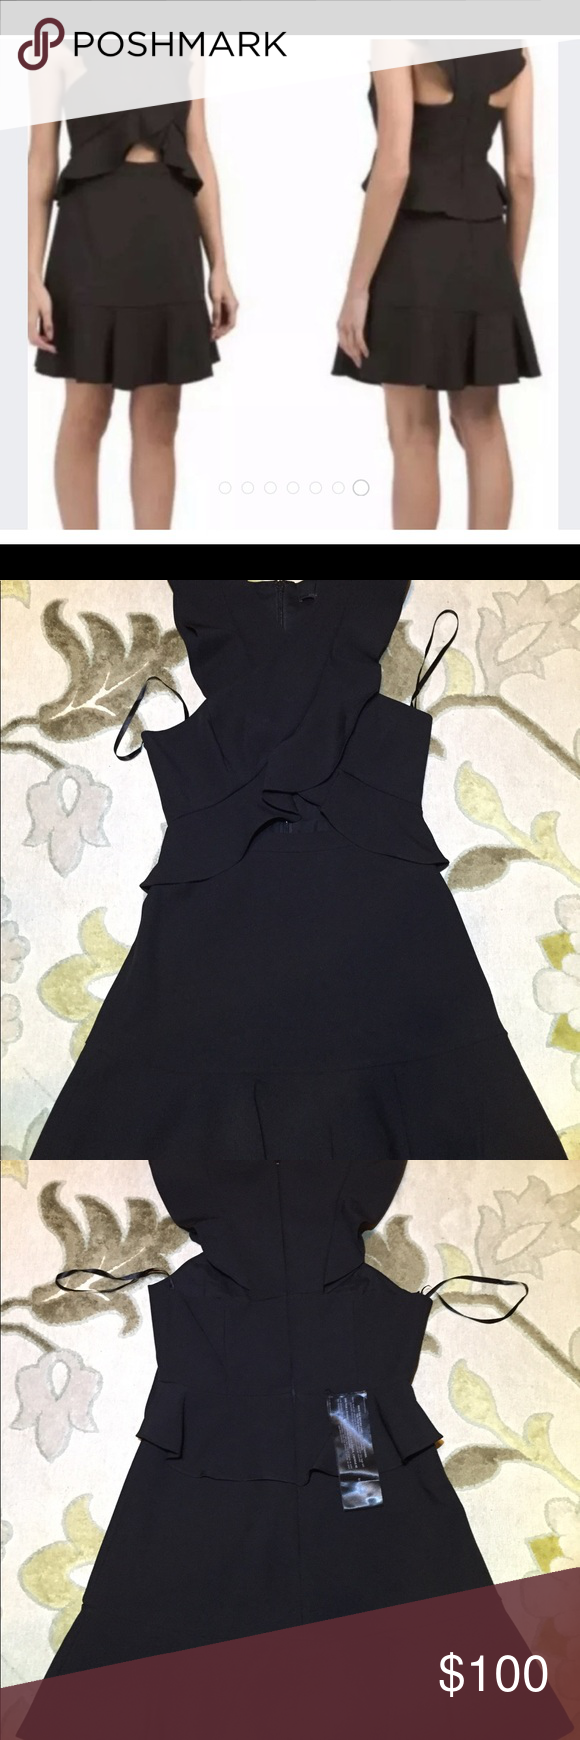 Nwt Bcbg Maxazria Careen Little Black Dress Sz 6 Little Black Dress Black Dress Clothes Design